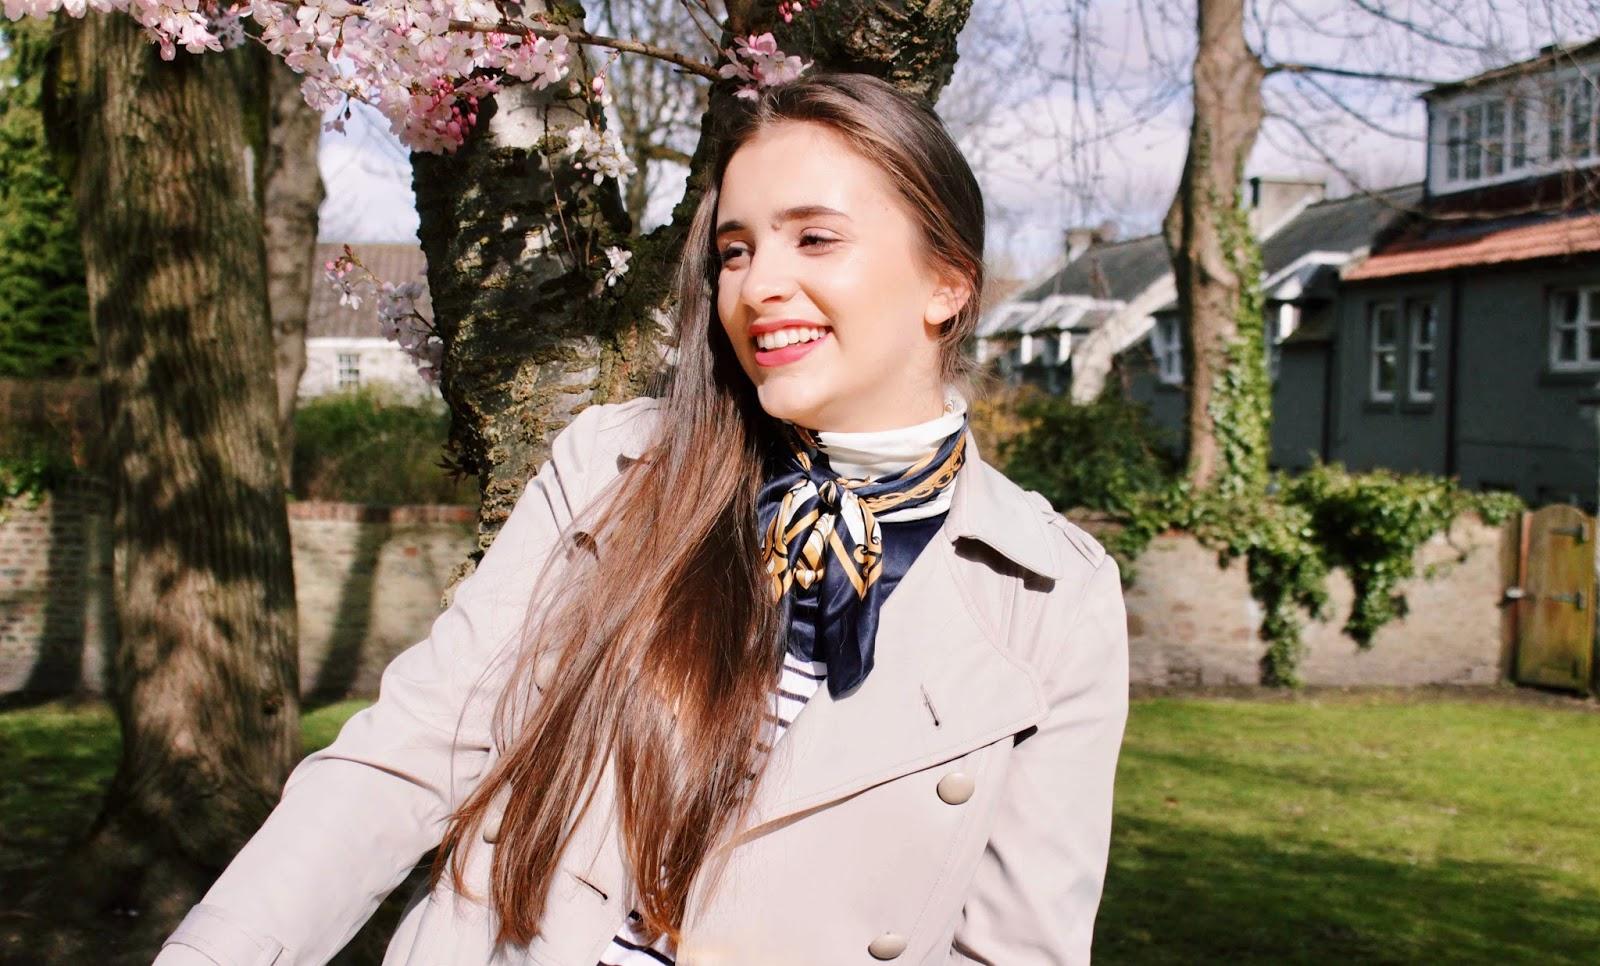 Girl laughing in spring